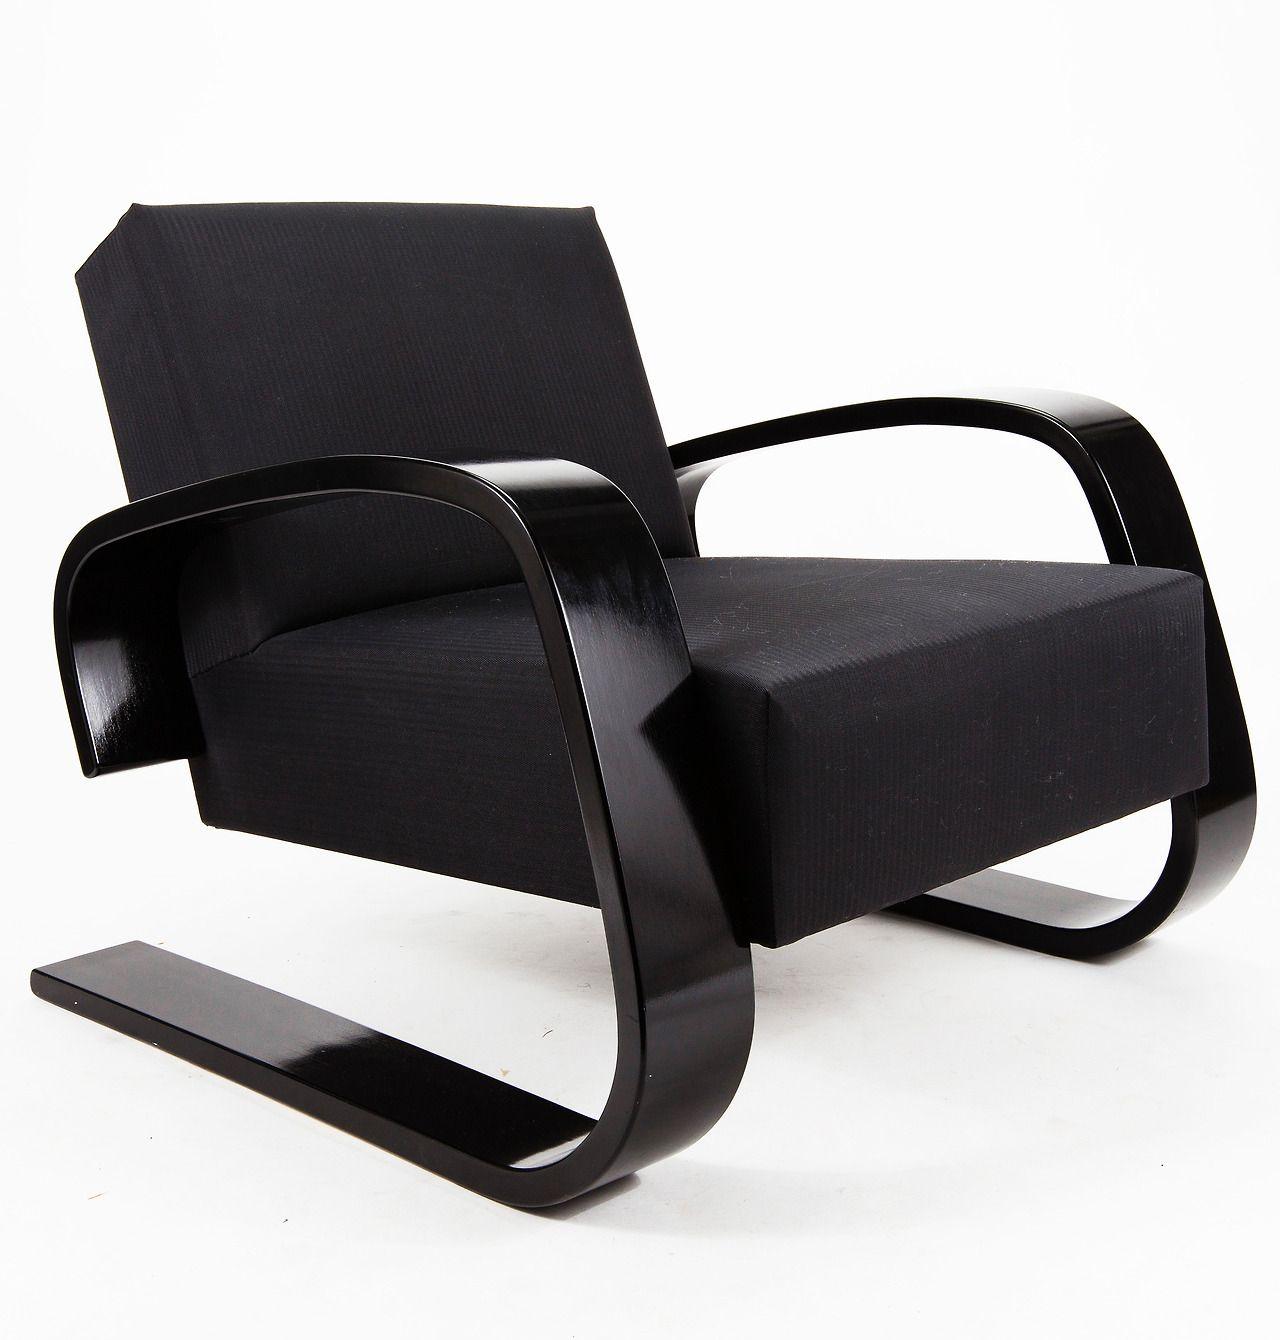 alvar aalto tank chair model designed in 1936 and produced by artek oy finland. Black Bedroom Furniture Sets. Home Design Ideas